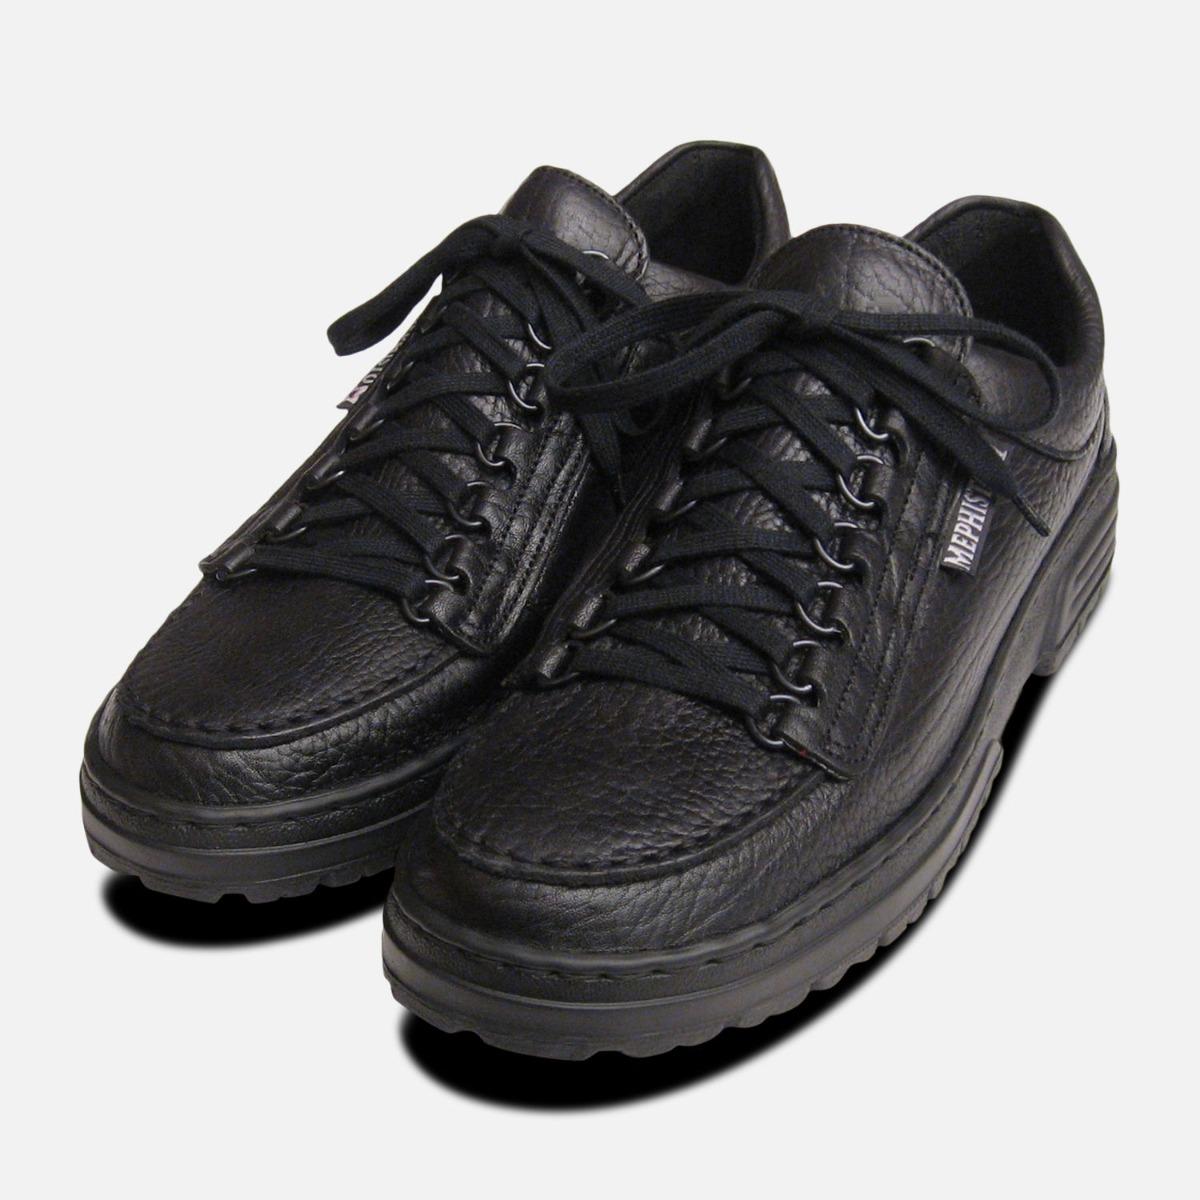 Mens Mephisto Shoes Rainbow in Black   eBay